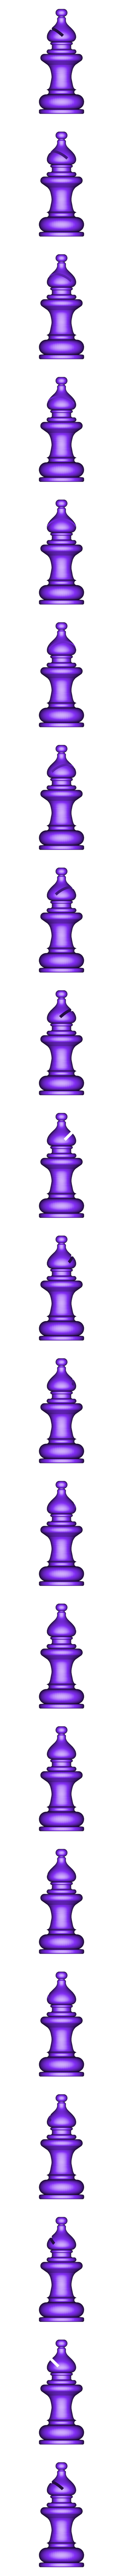 Bishop.STL Download free STL file Chess set / Chess set • 3D printable model, OC3D